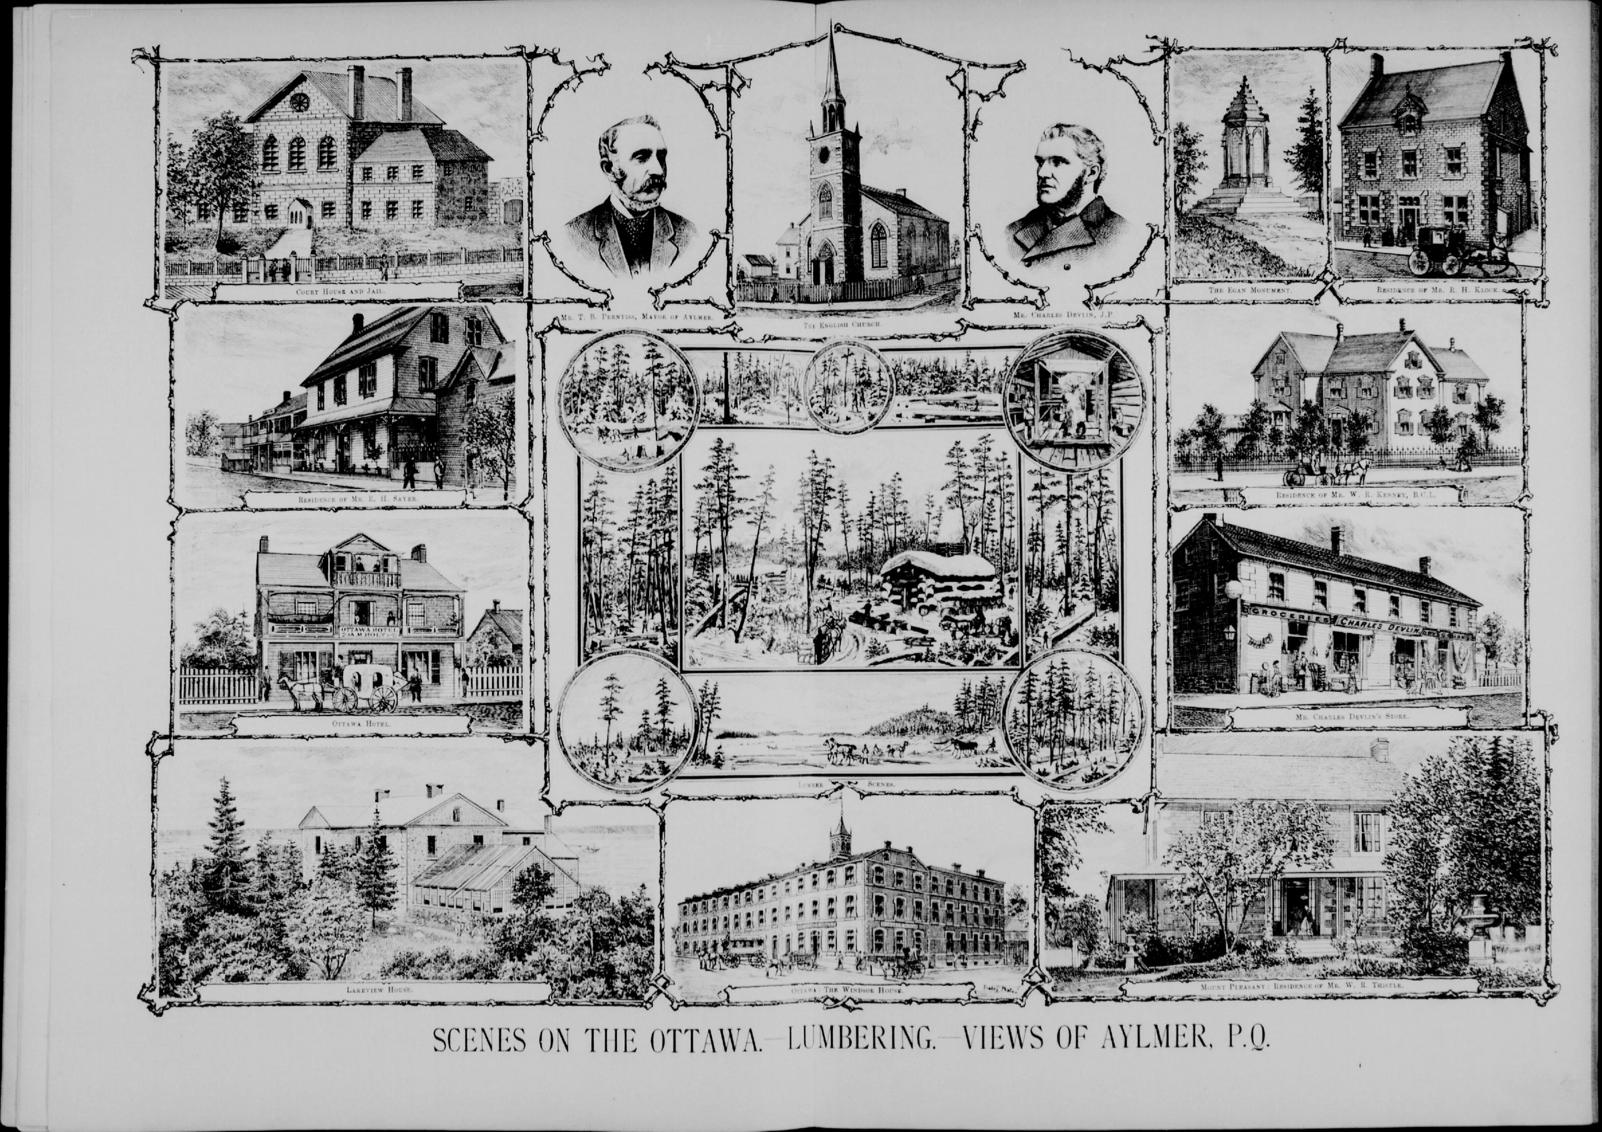 Scenes on the Ottawa. Lumbering. Views of Aylmer, P.Q. vol.XVIII, no. 10. 152-153